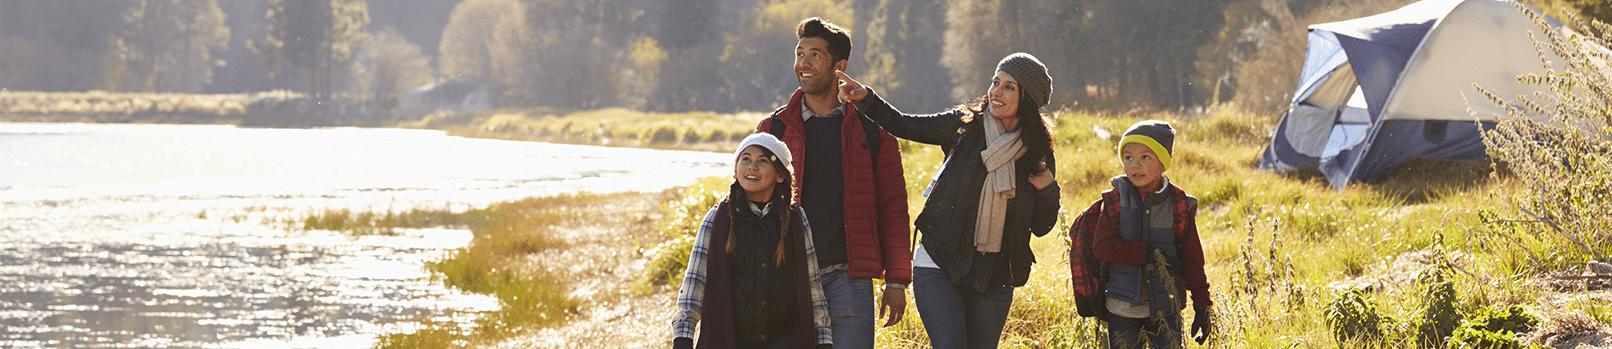 bigstock Family on a camping trip walki 134867066png